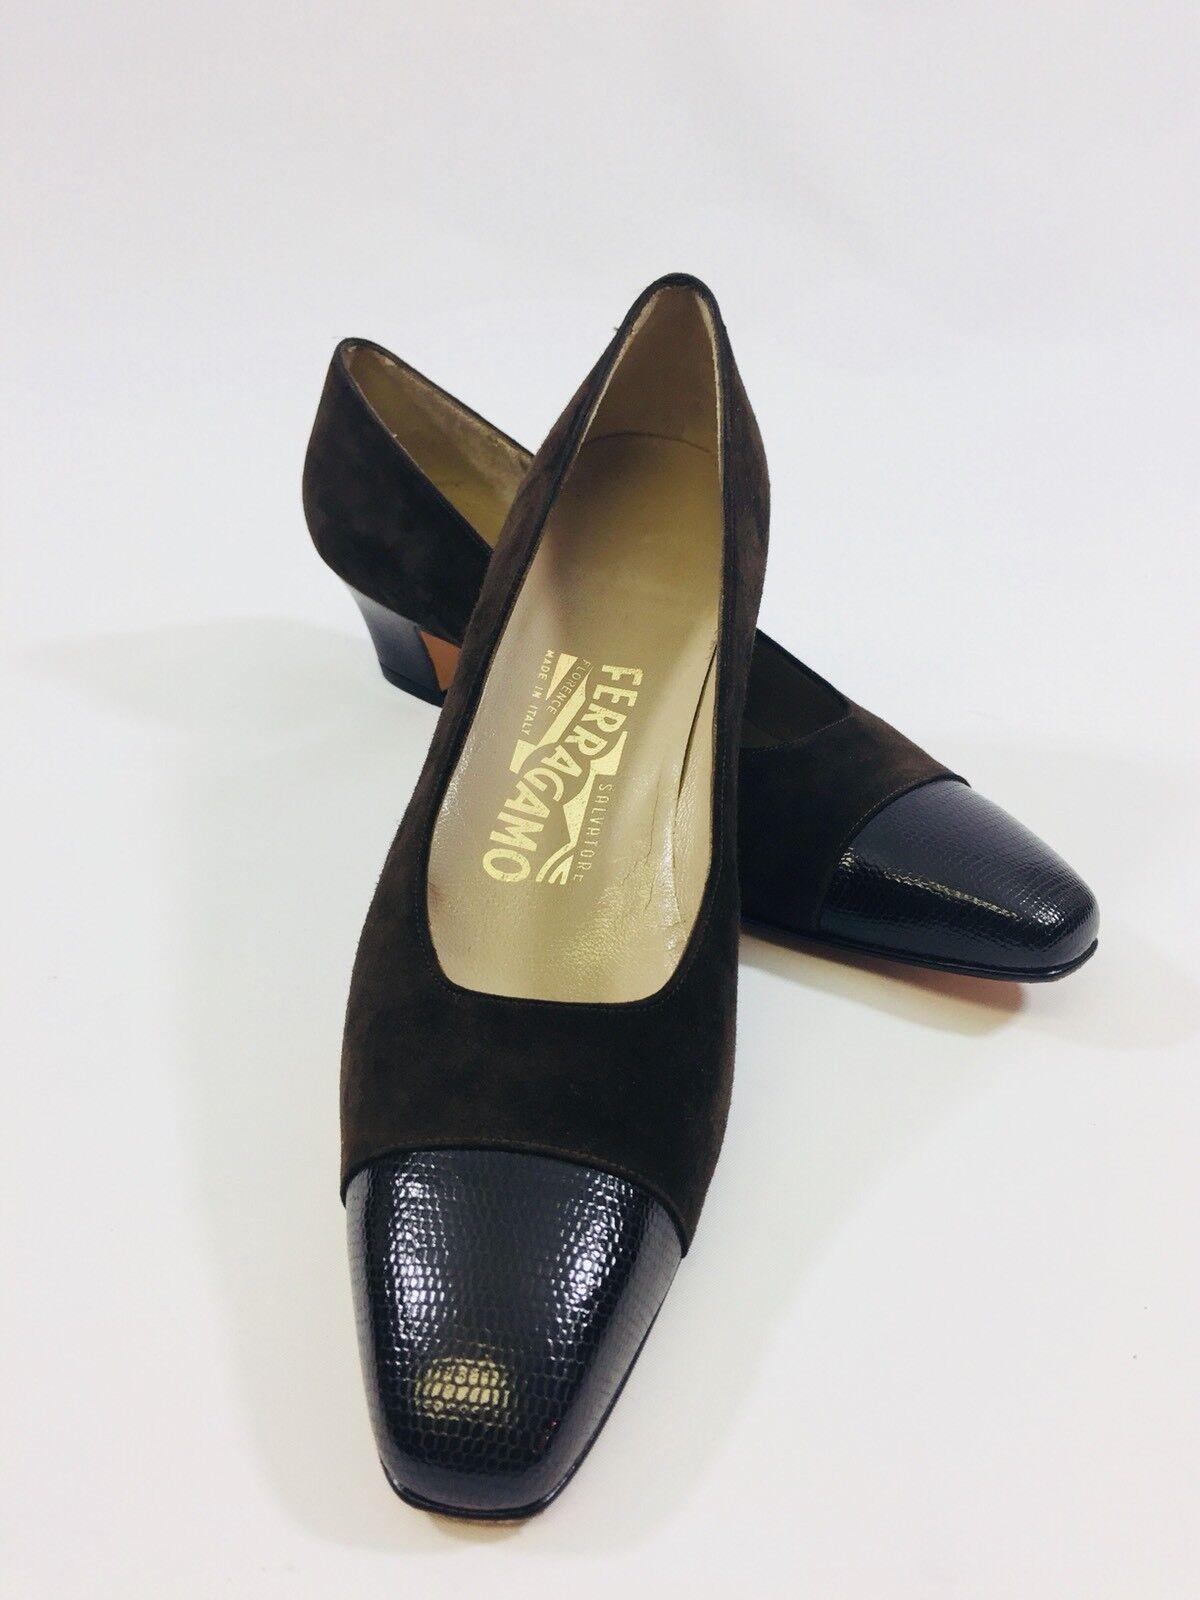 Salvatore Ferragamo  Women's sz 8 1 2 A Brown Suede Capped Toe Slide Pumps